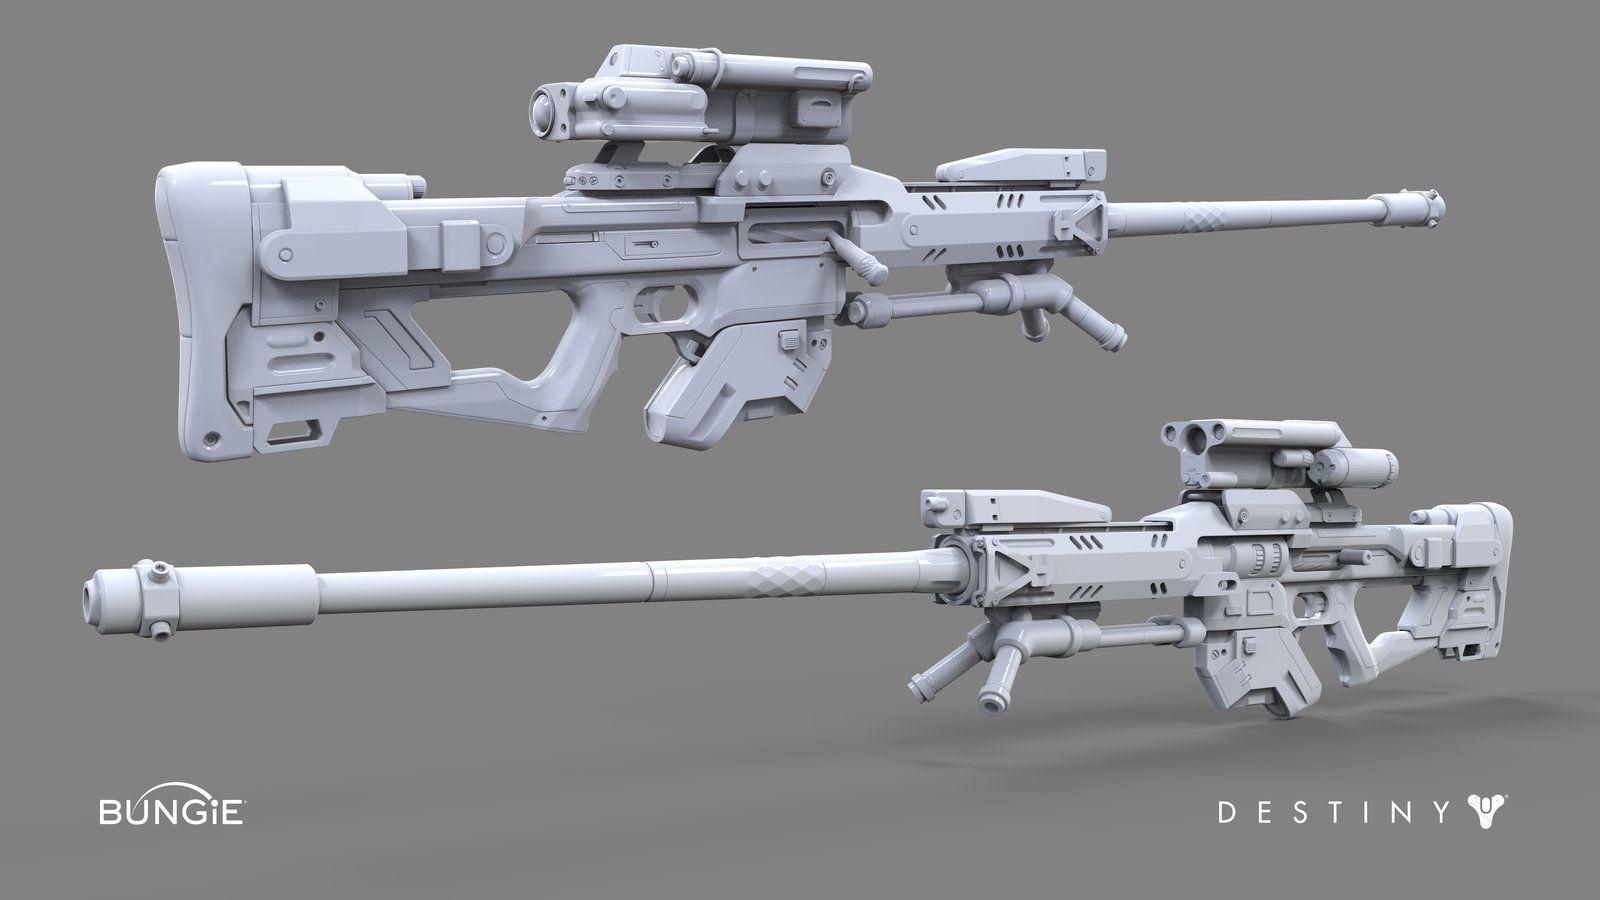 Destiny: Sniper Rifle C, David Stammel on ArtStation at http://www.artstation.com/artwork/destiny-sniper-rifle-c